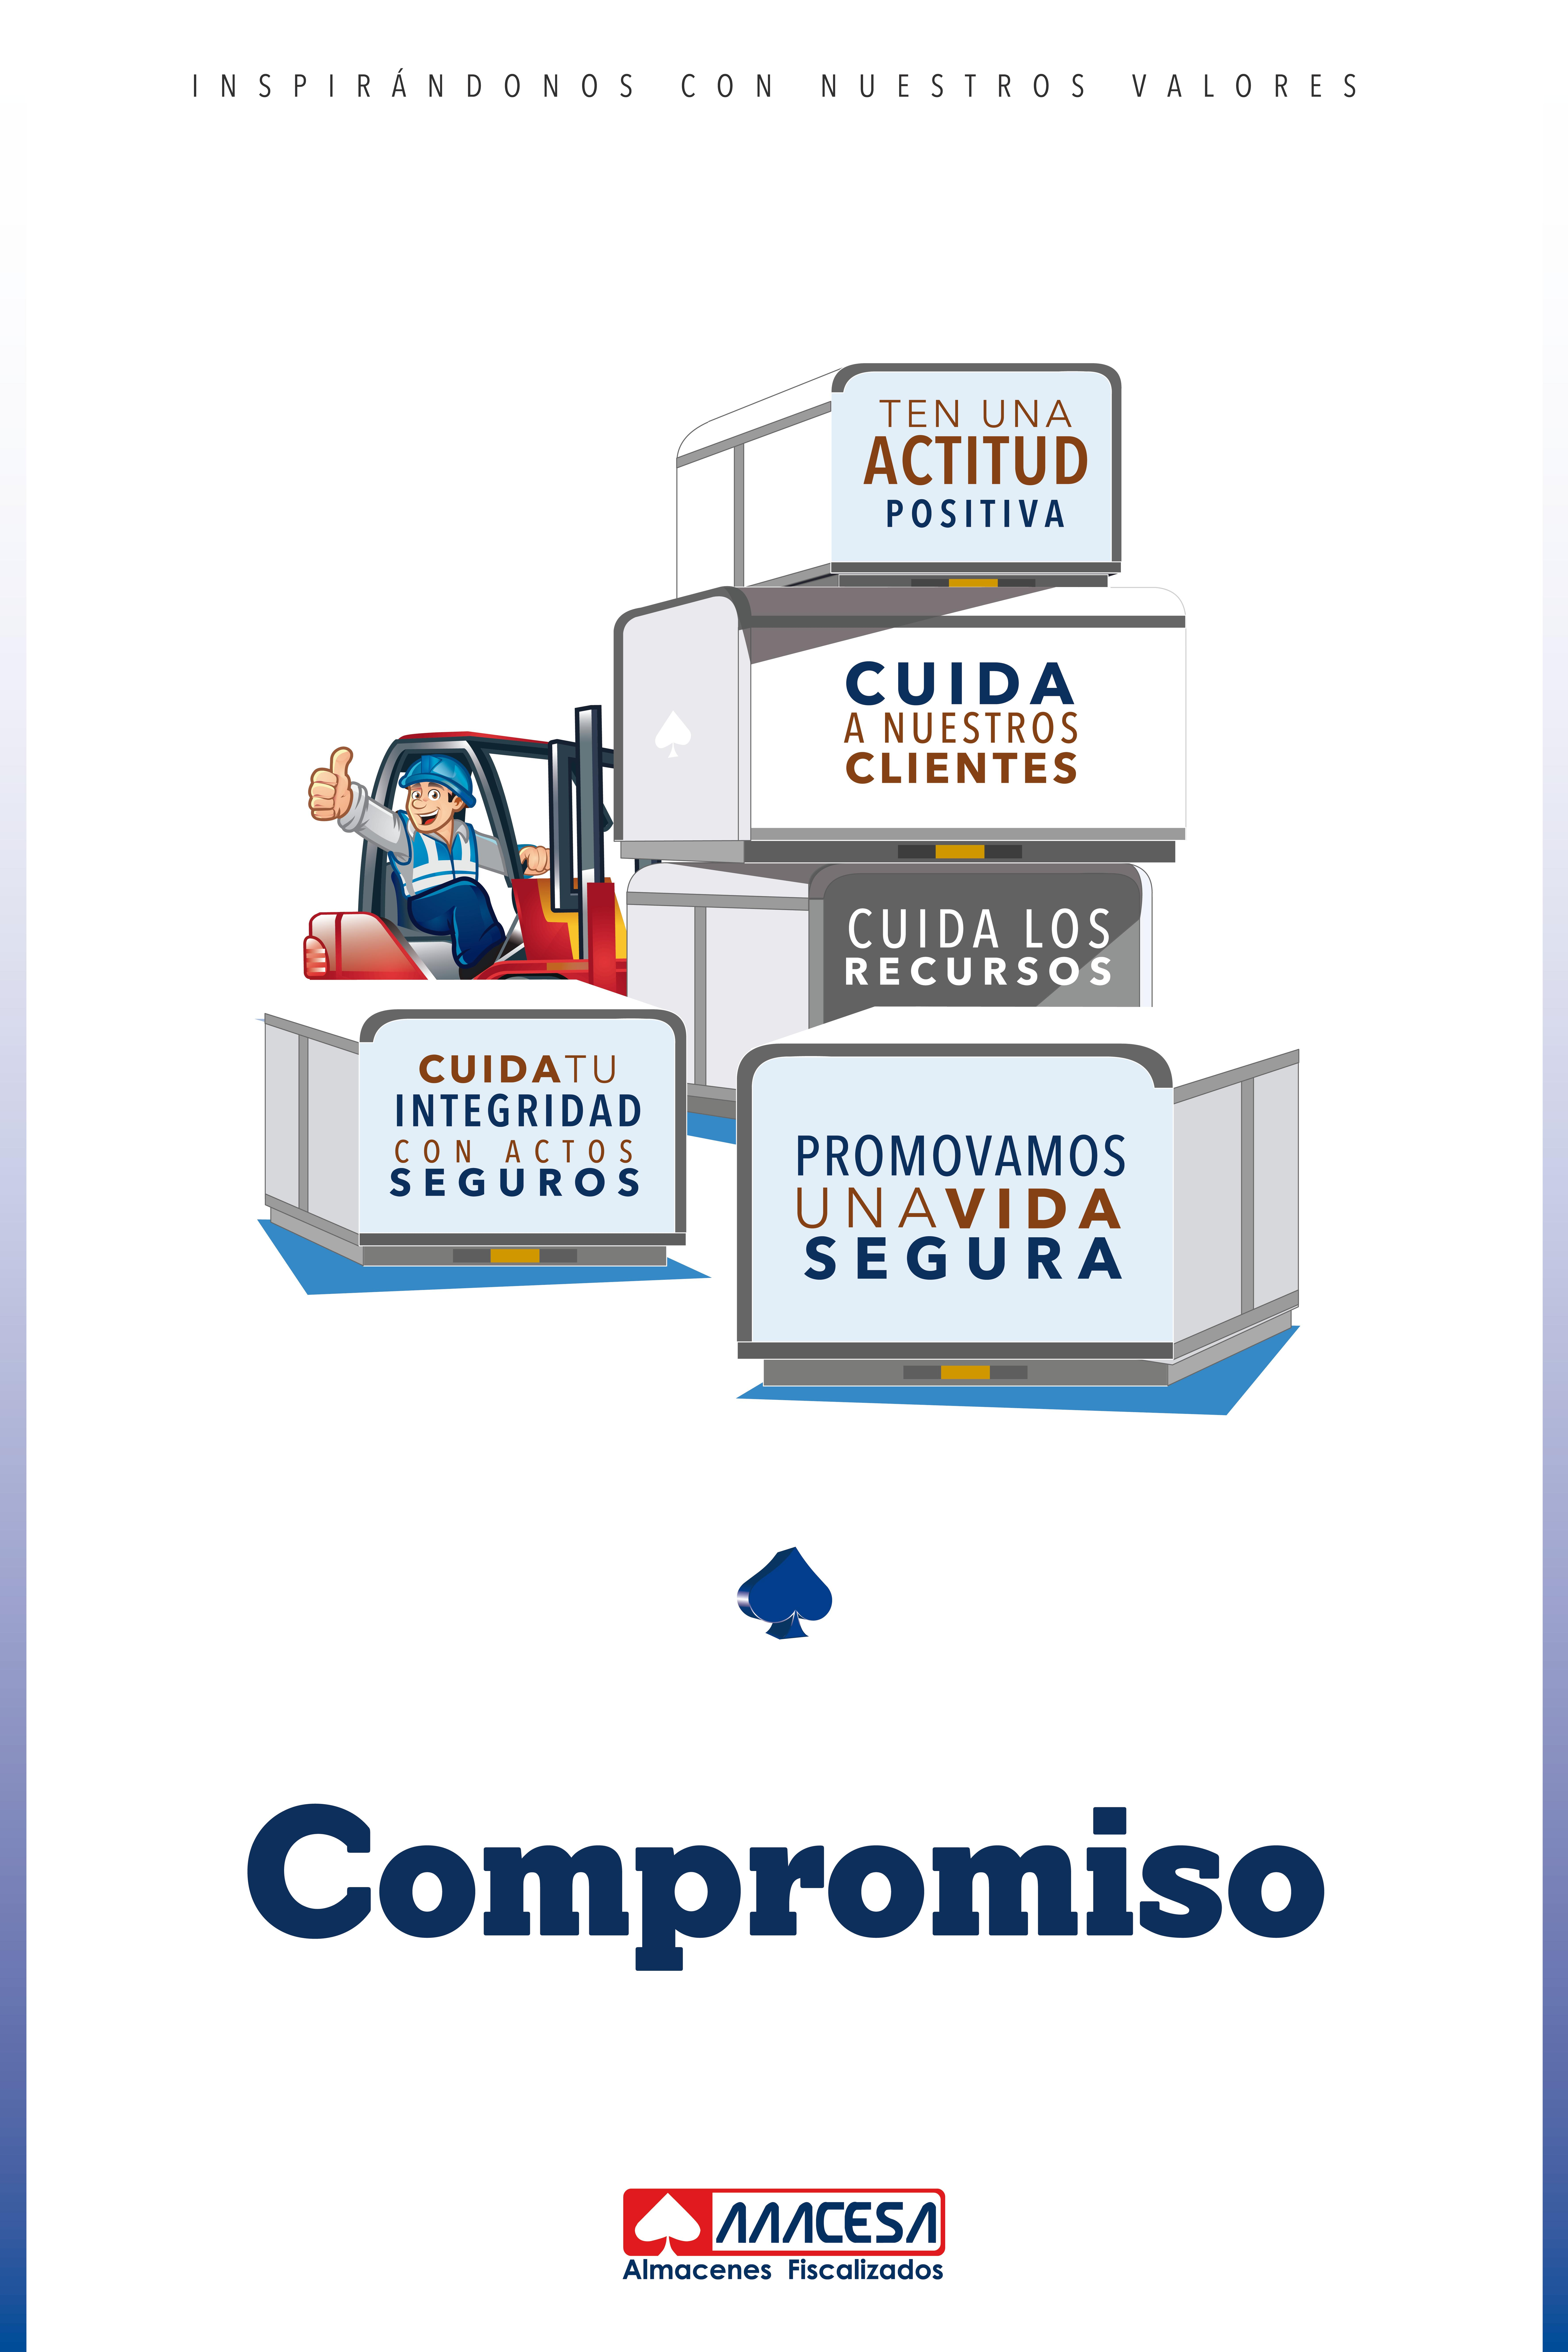 Campaña de Valores Corporativos